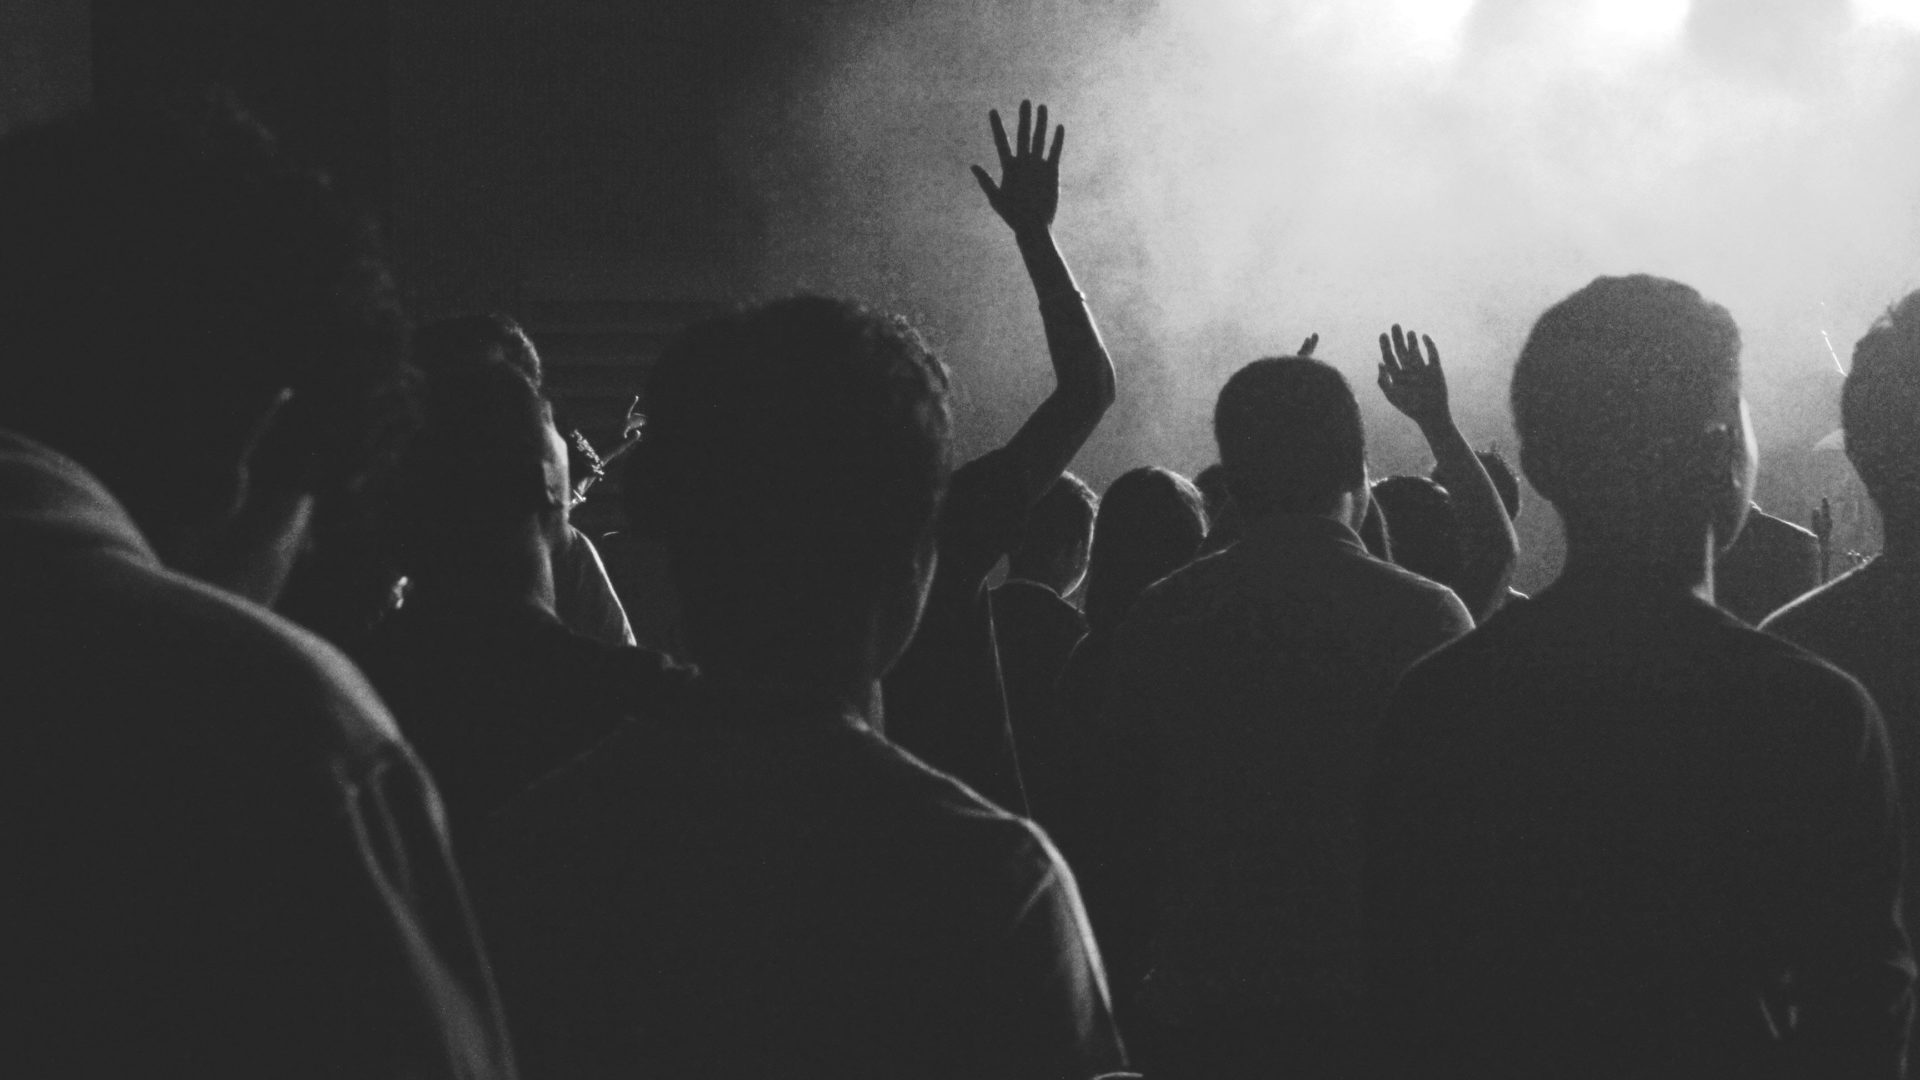 We Believe Kids: The Church Hero Image